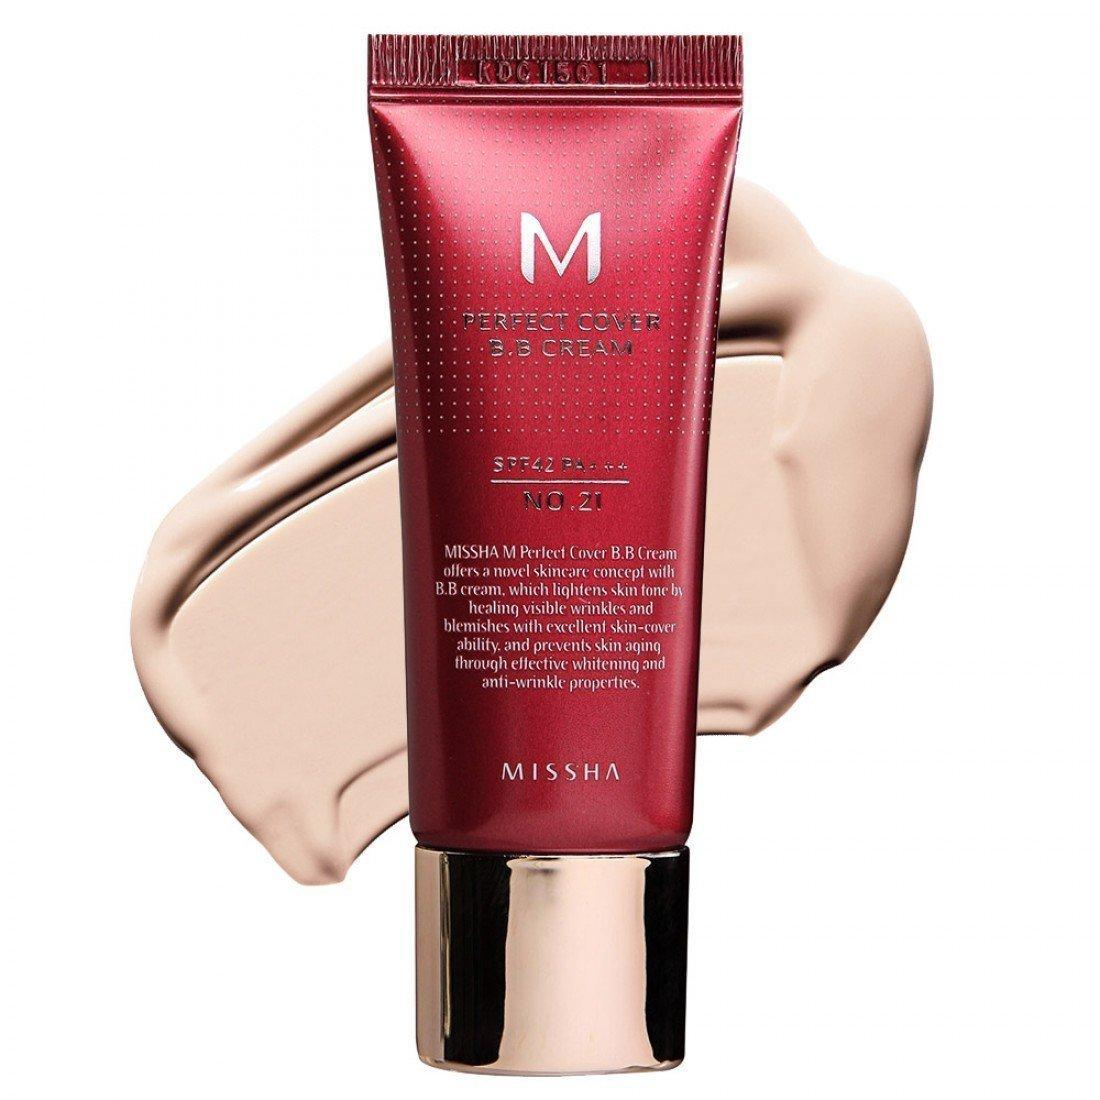 ВВ крем M Perfect Cover BB Cream (No.25 Natural Beige) 20ml